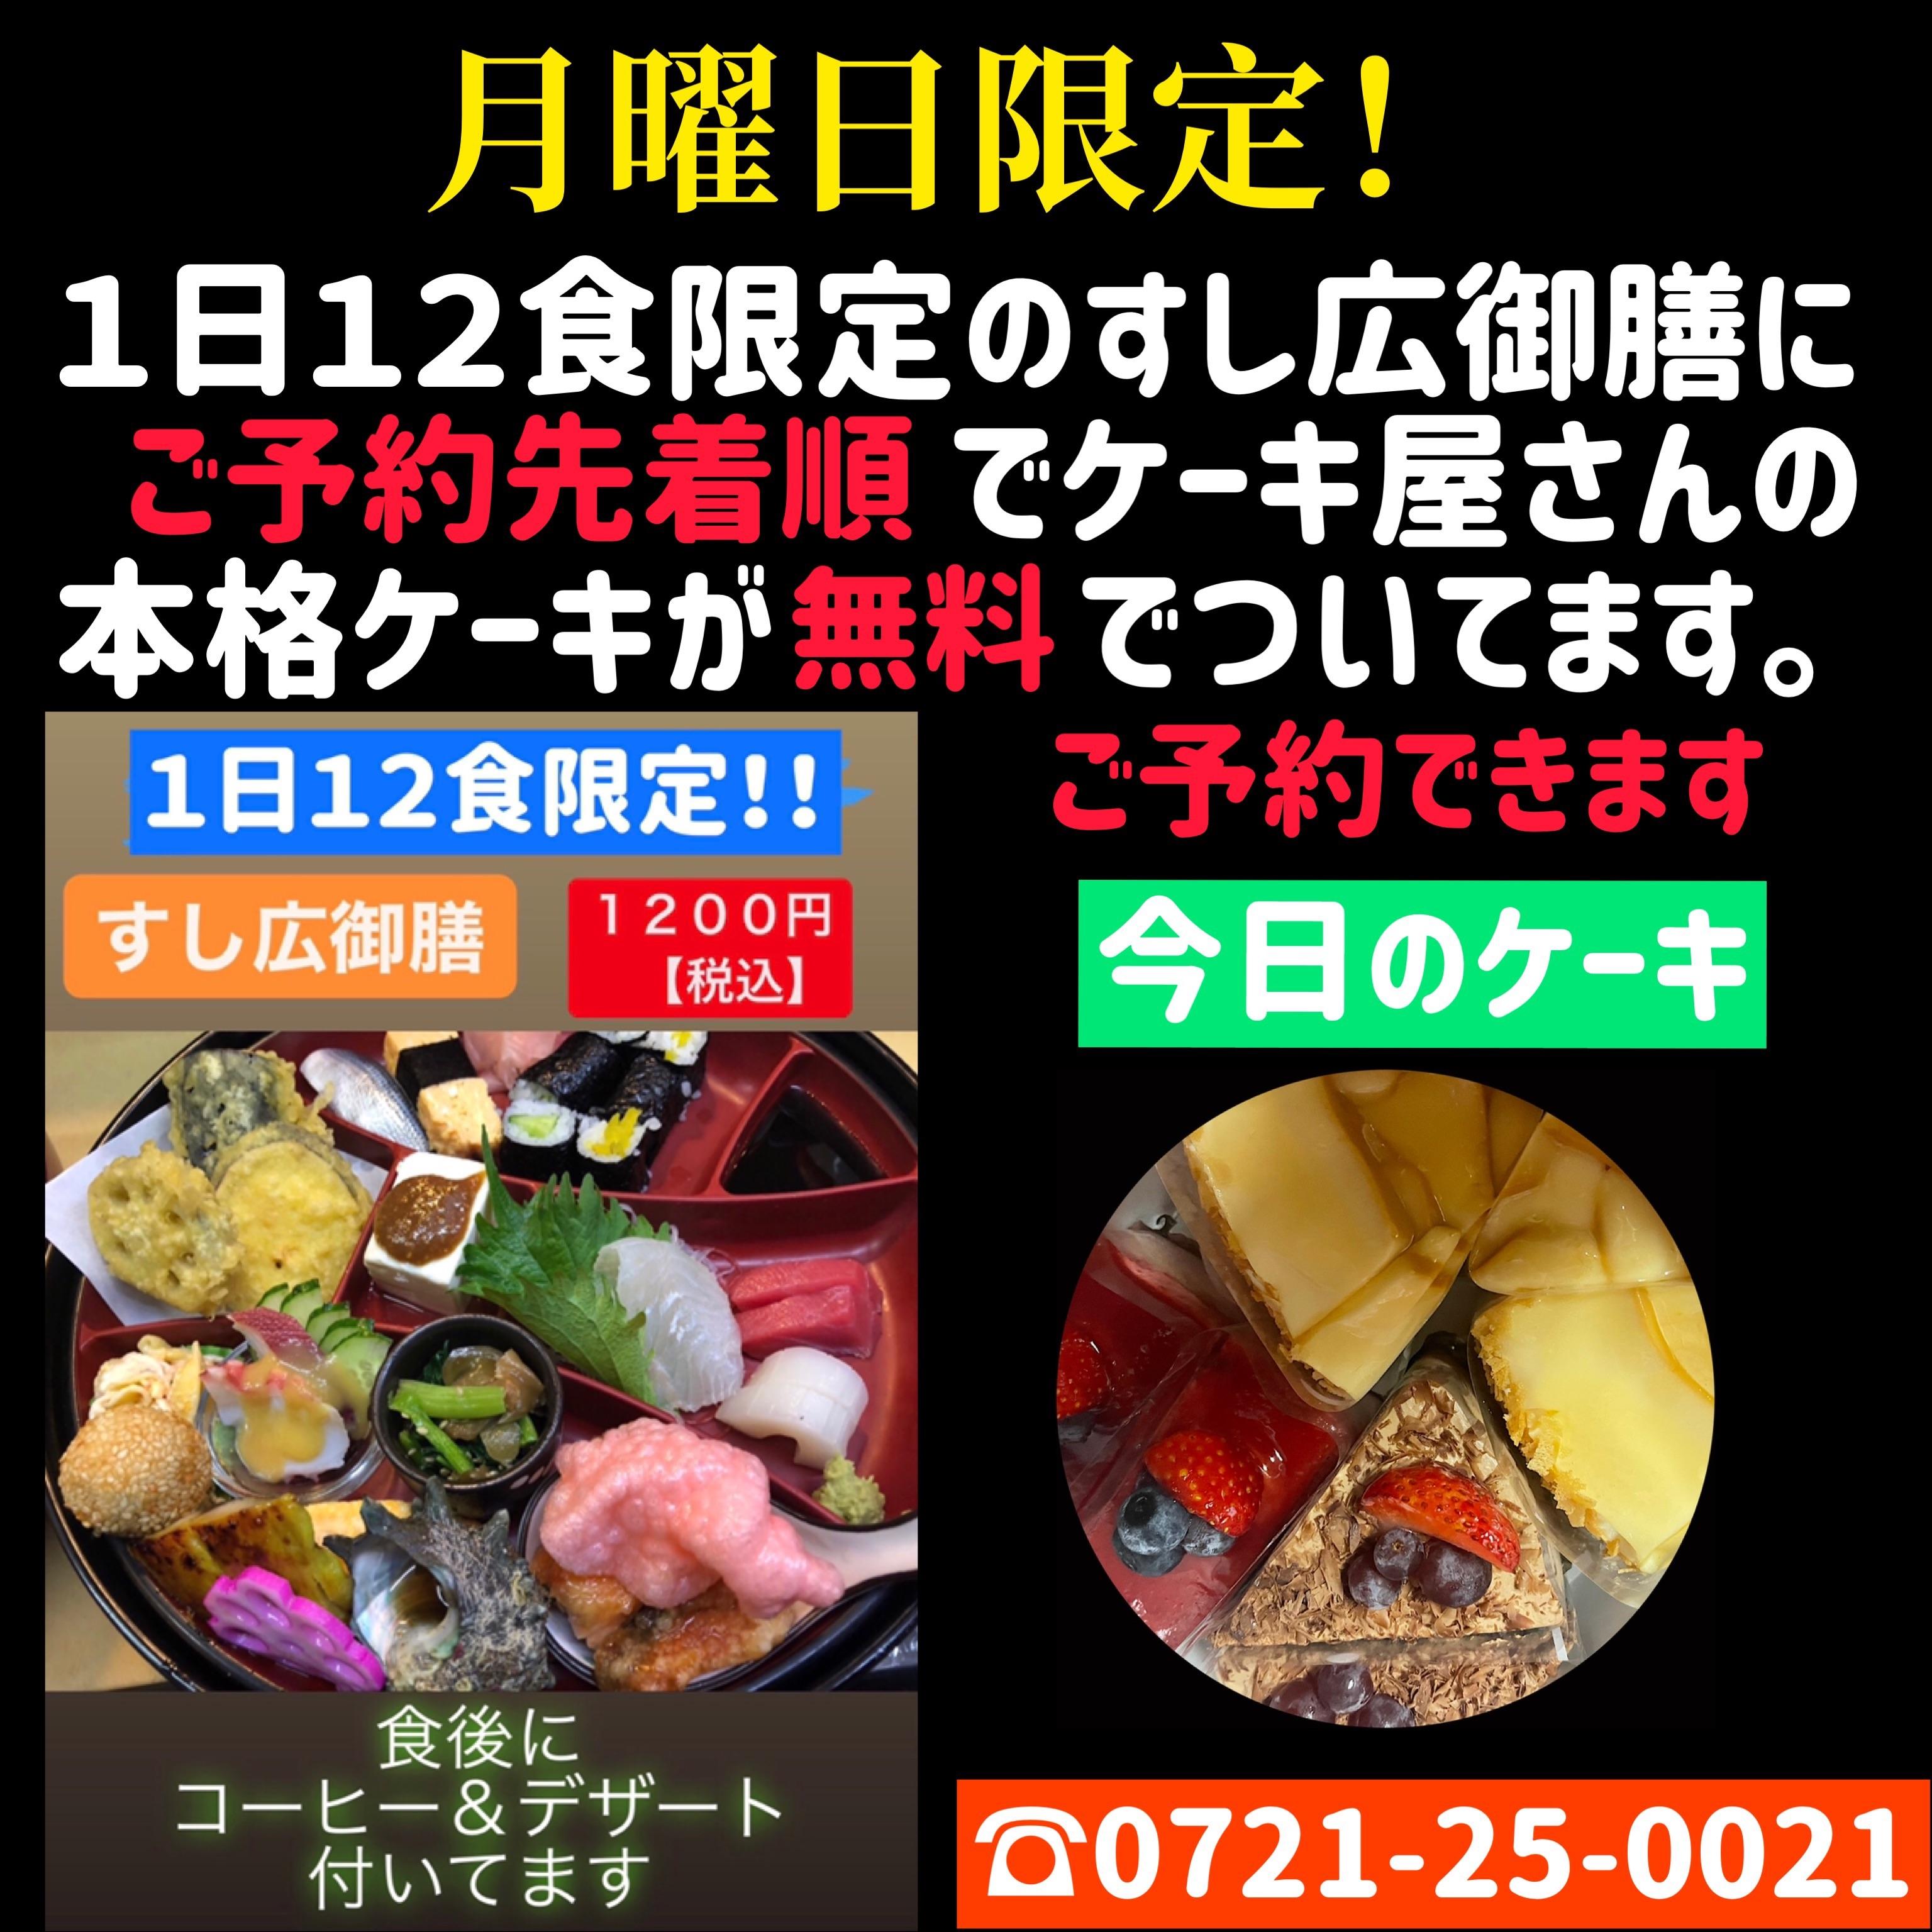 f:id:carp_0301_kenta:20210726083807j:image